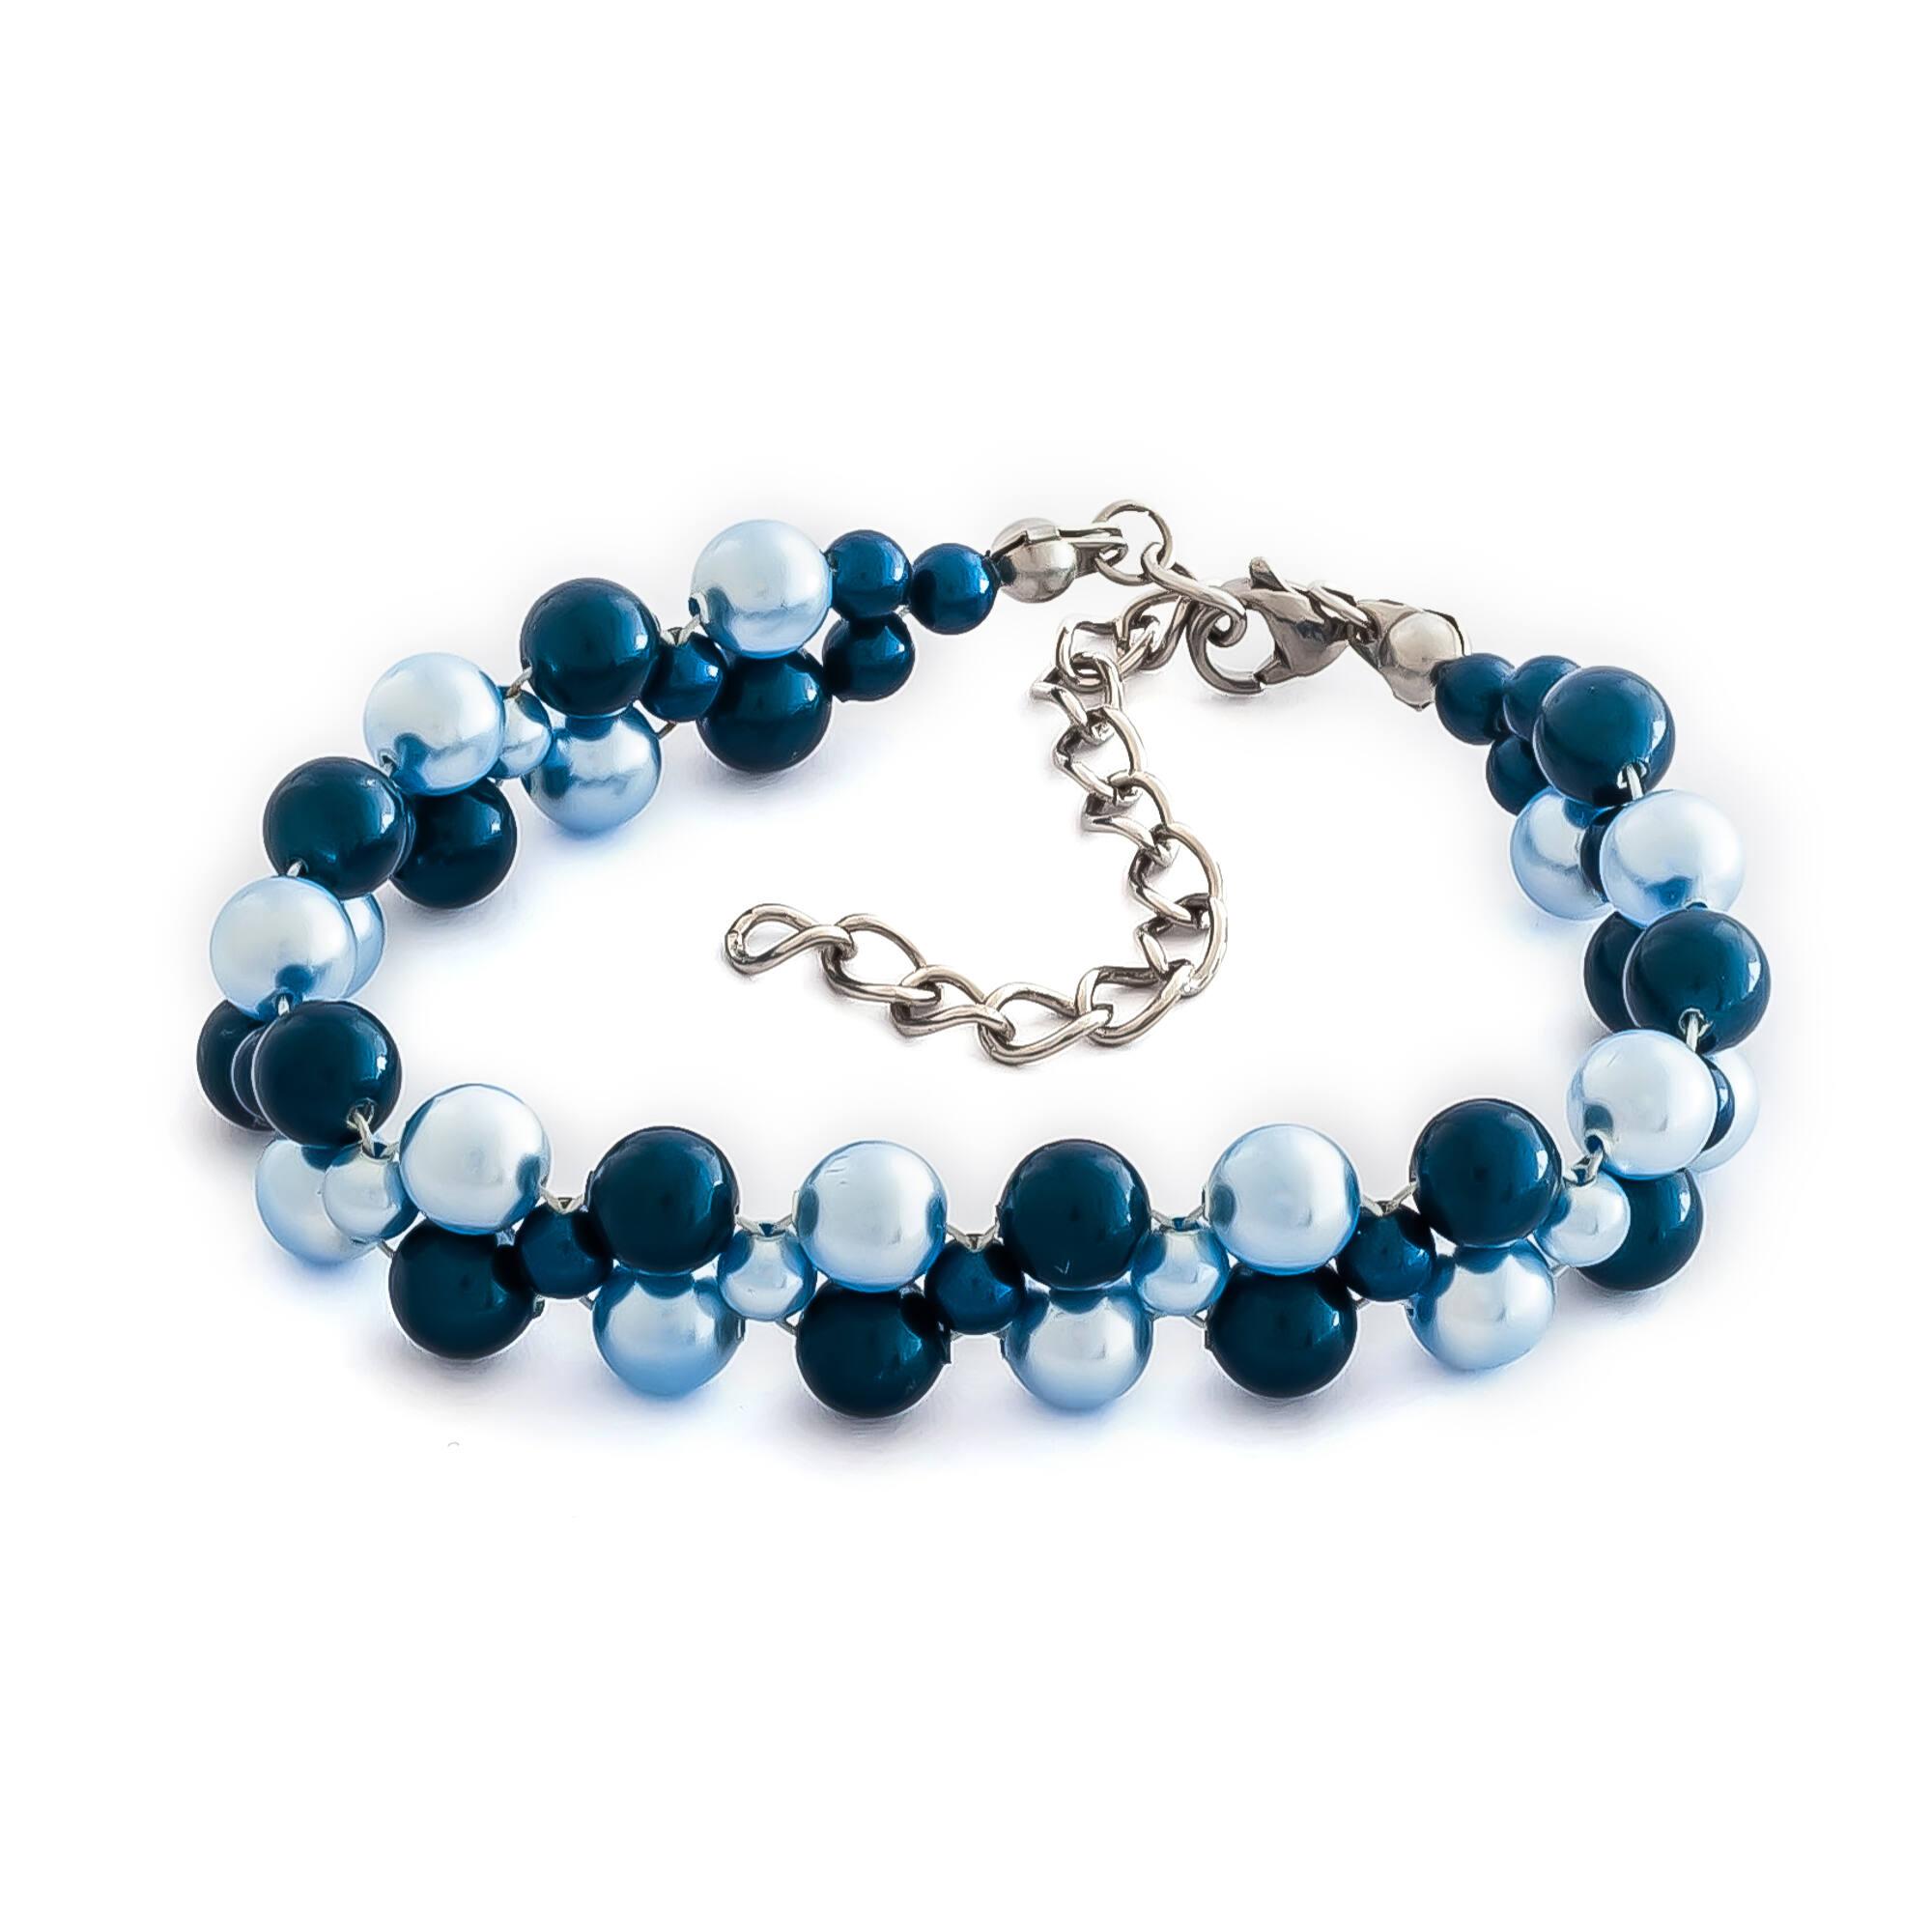 GYÖNGY KARKÖTŐ - dark blue/light blue